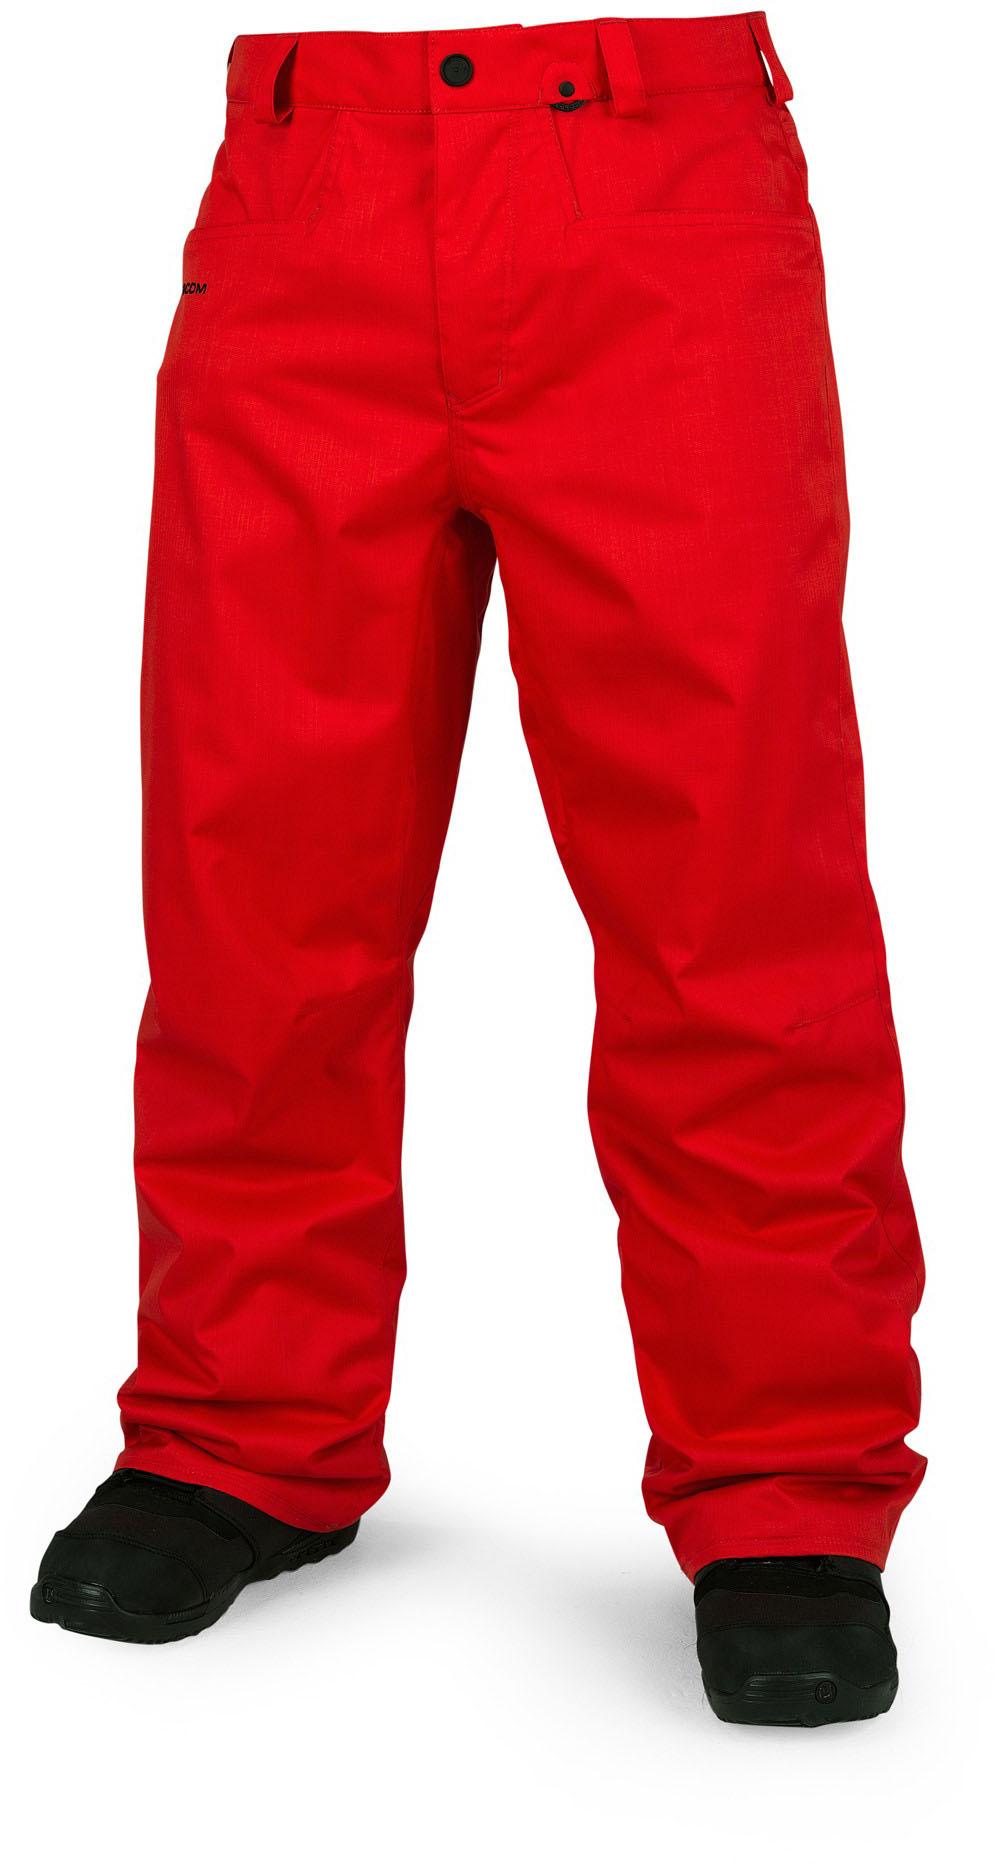 image volcom-carbon-red-jpg